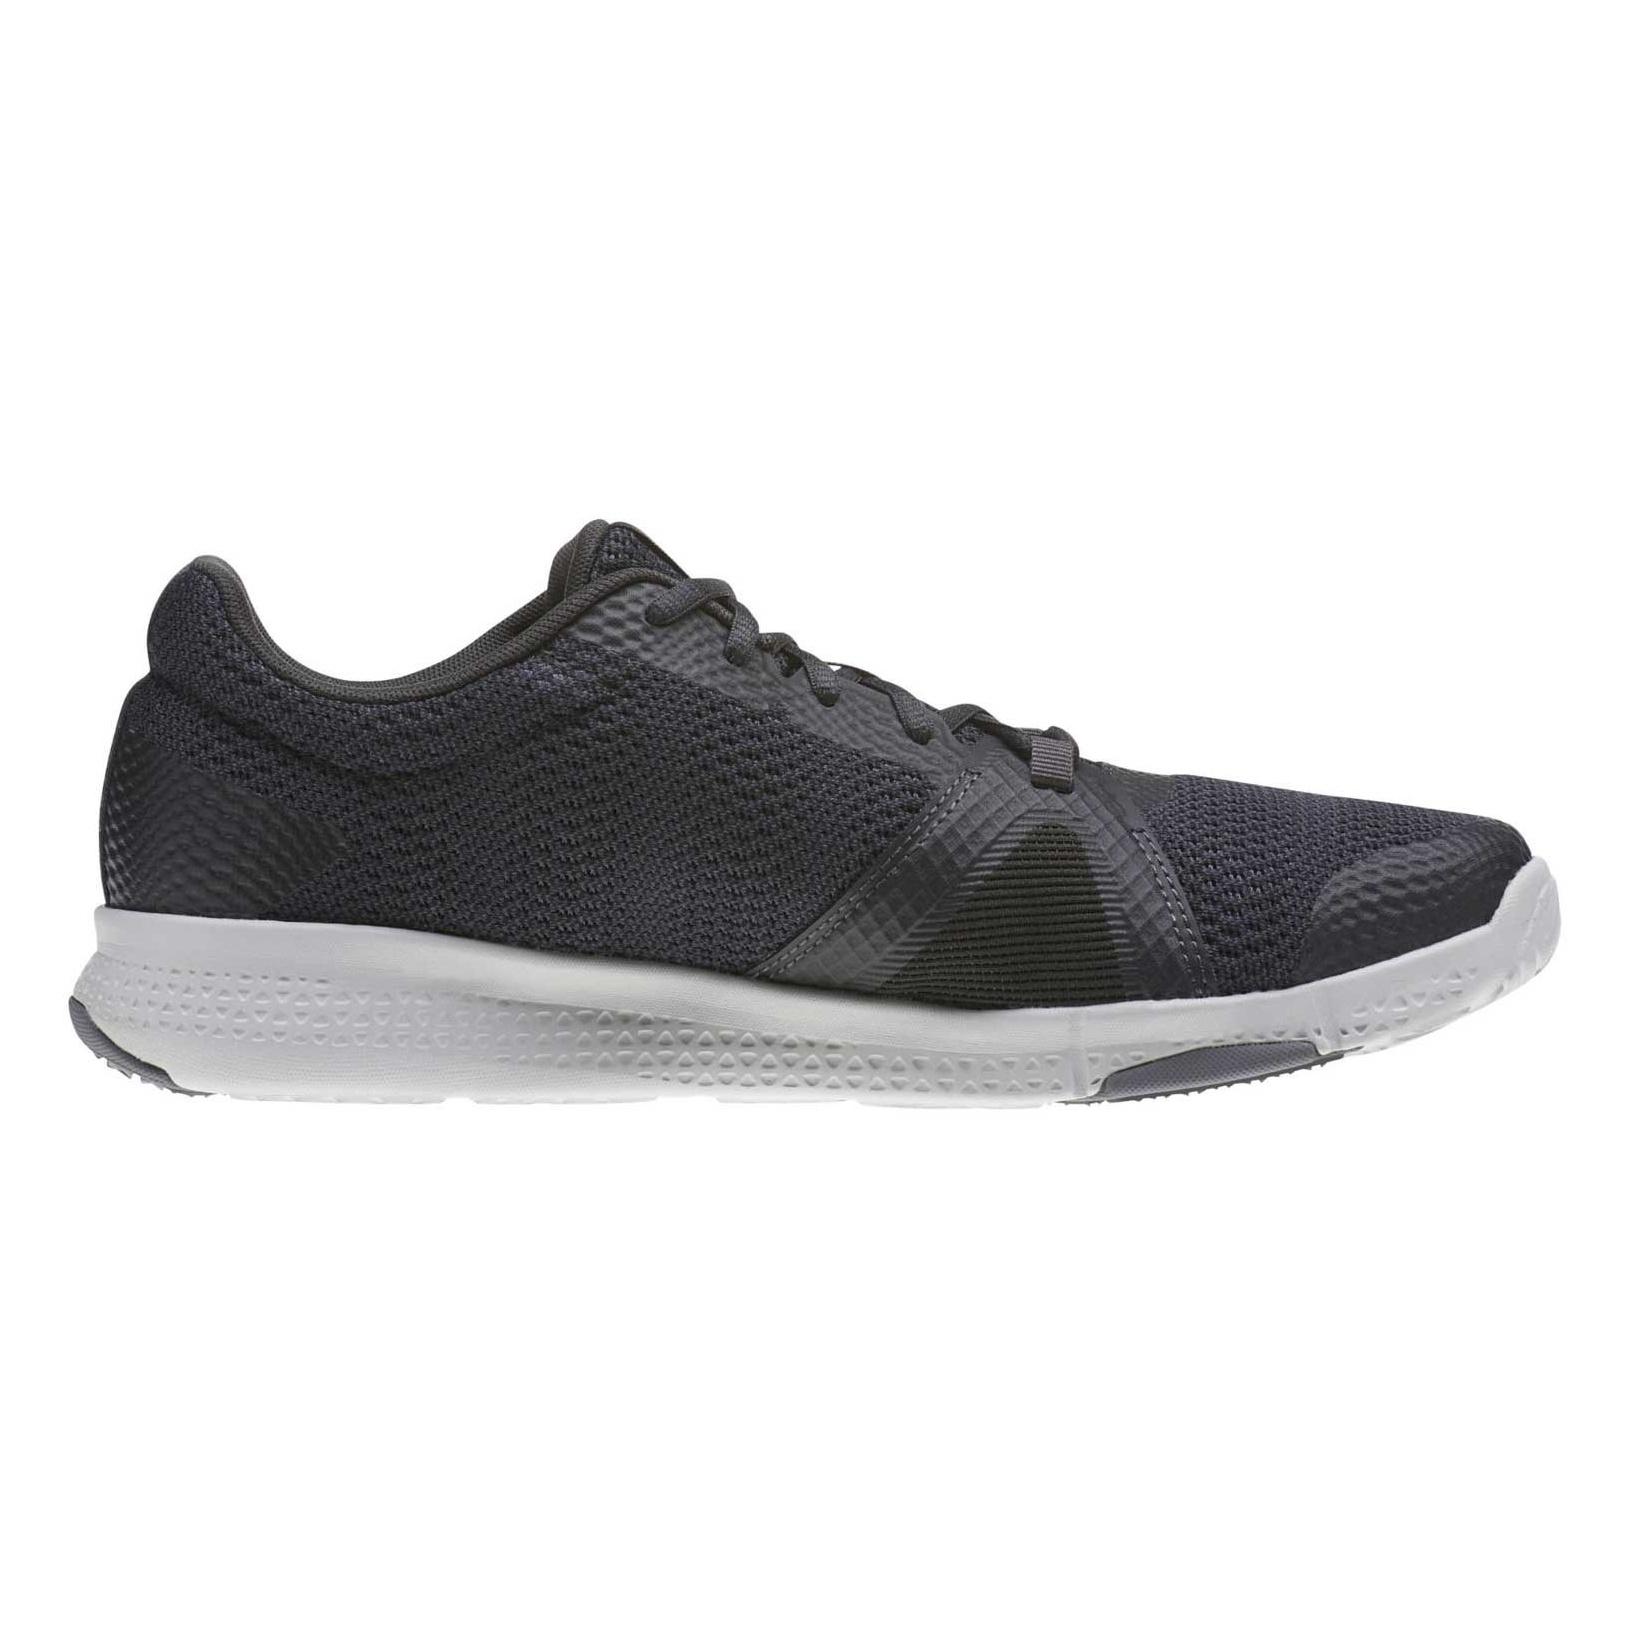 کفش دویدن بندی مردانه Flexile - ریباک